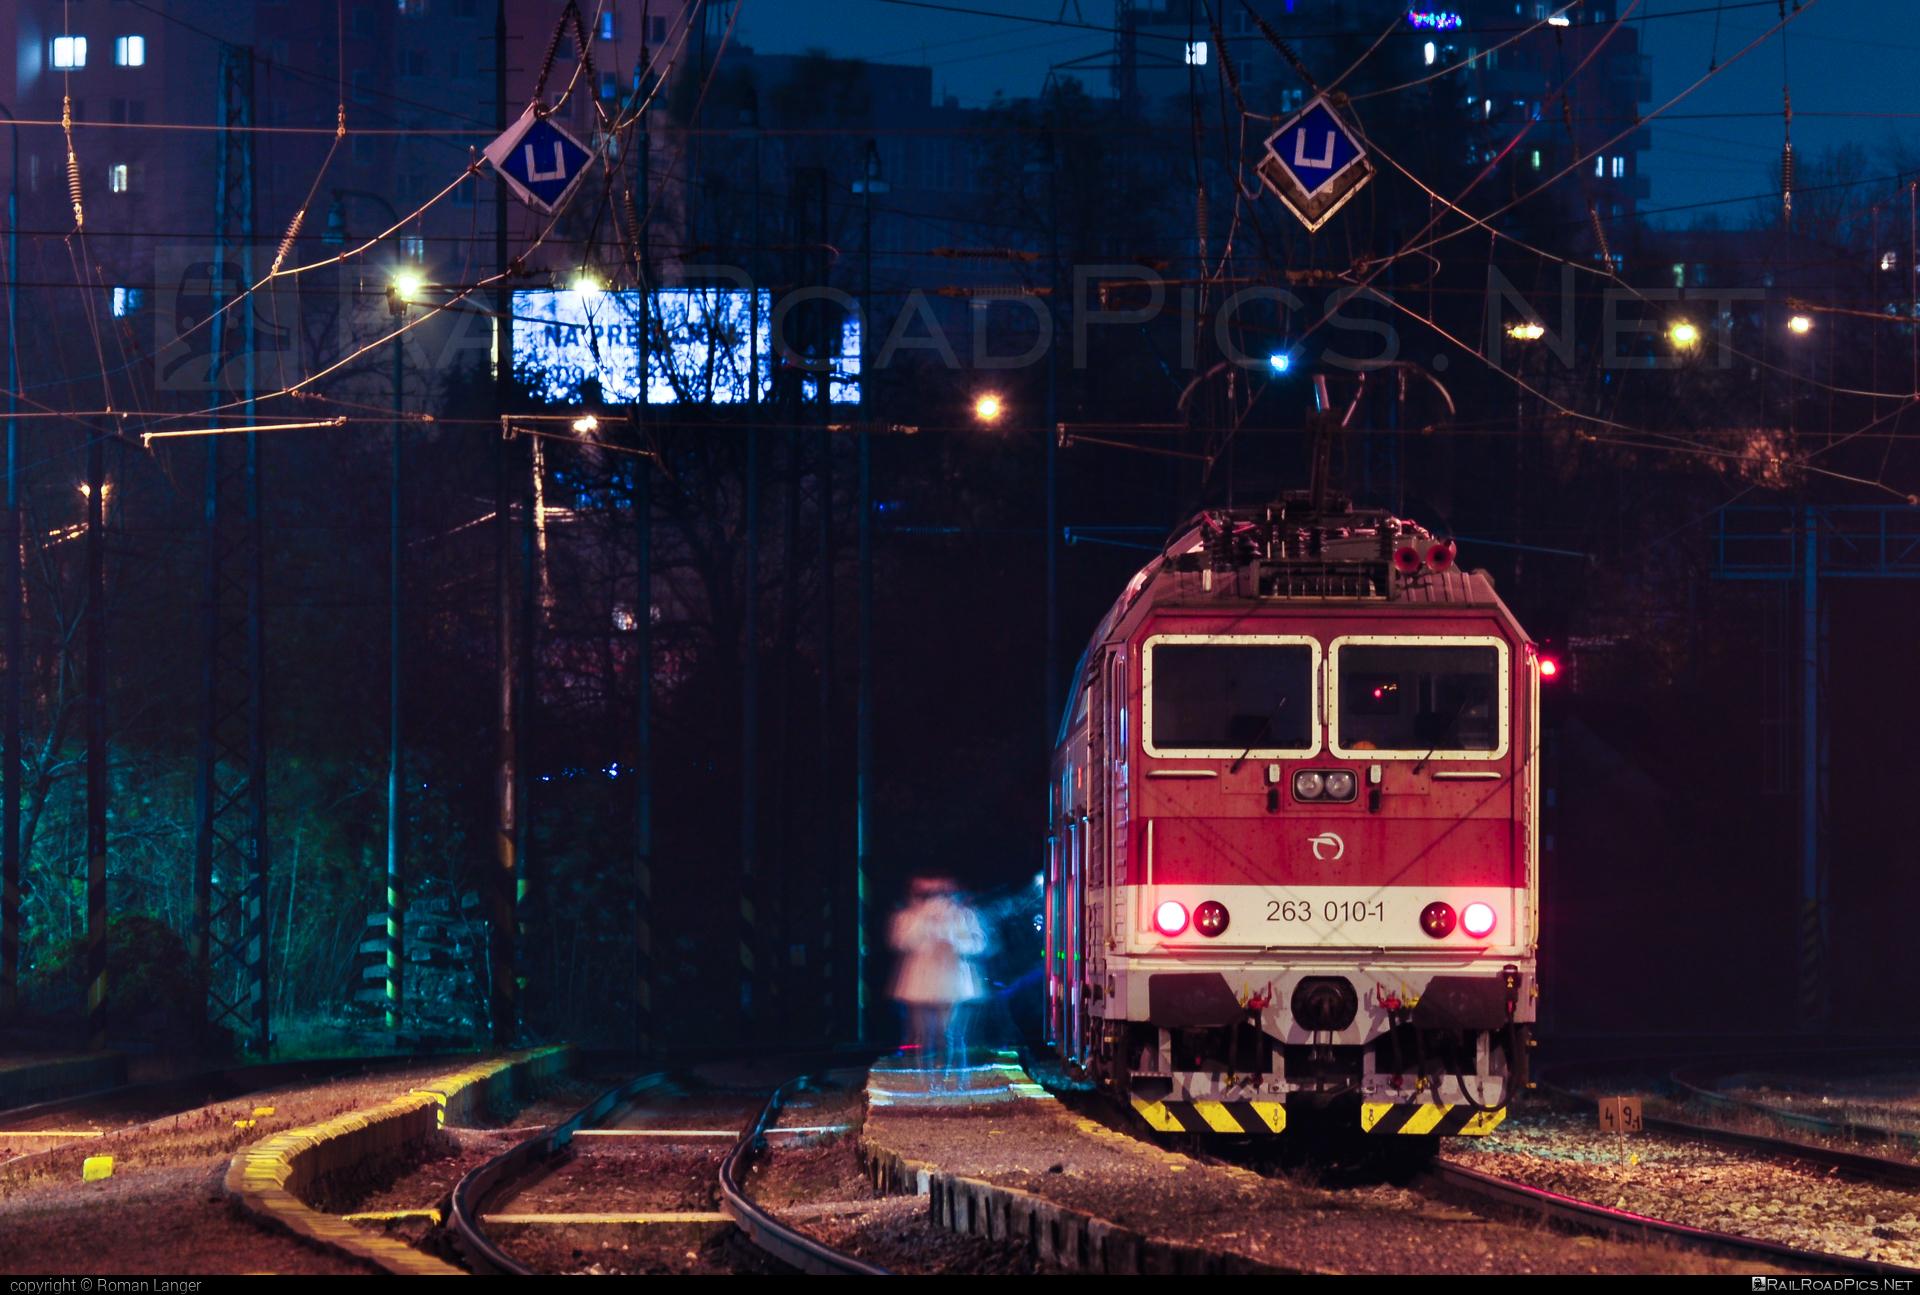 Škoda 70E - 263 010-1 operated by Železničná Spoločnost' Slovensko, a.s. #ZeleznicnaSpolocnostSlovensko #locomotive263 #princezna #skoda #skoda70e #zssk